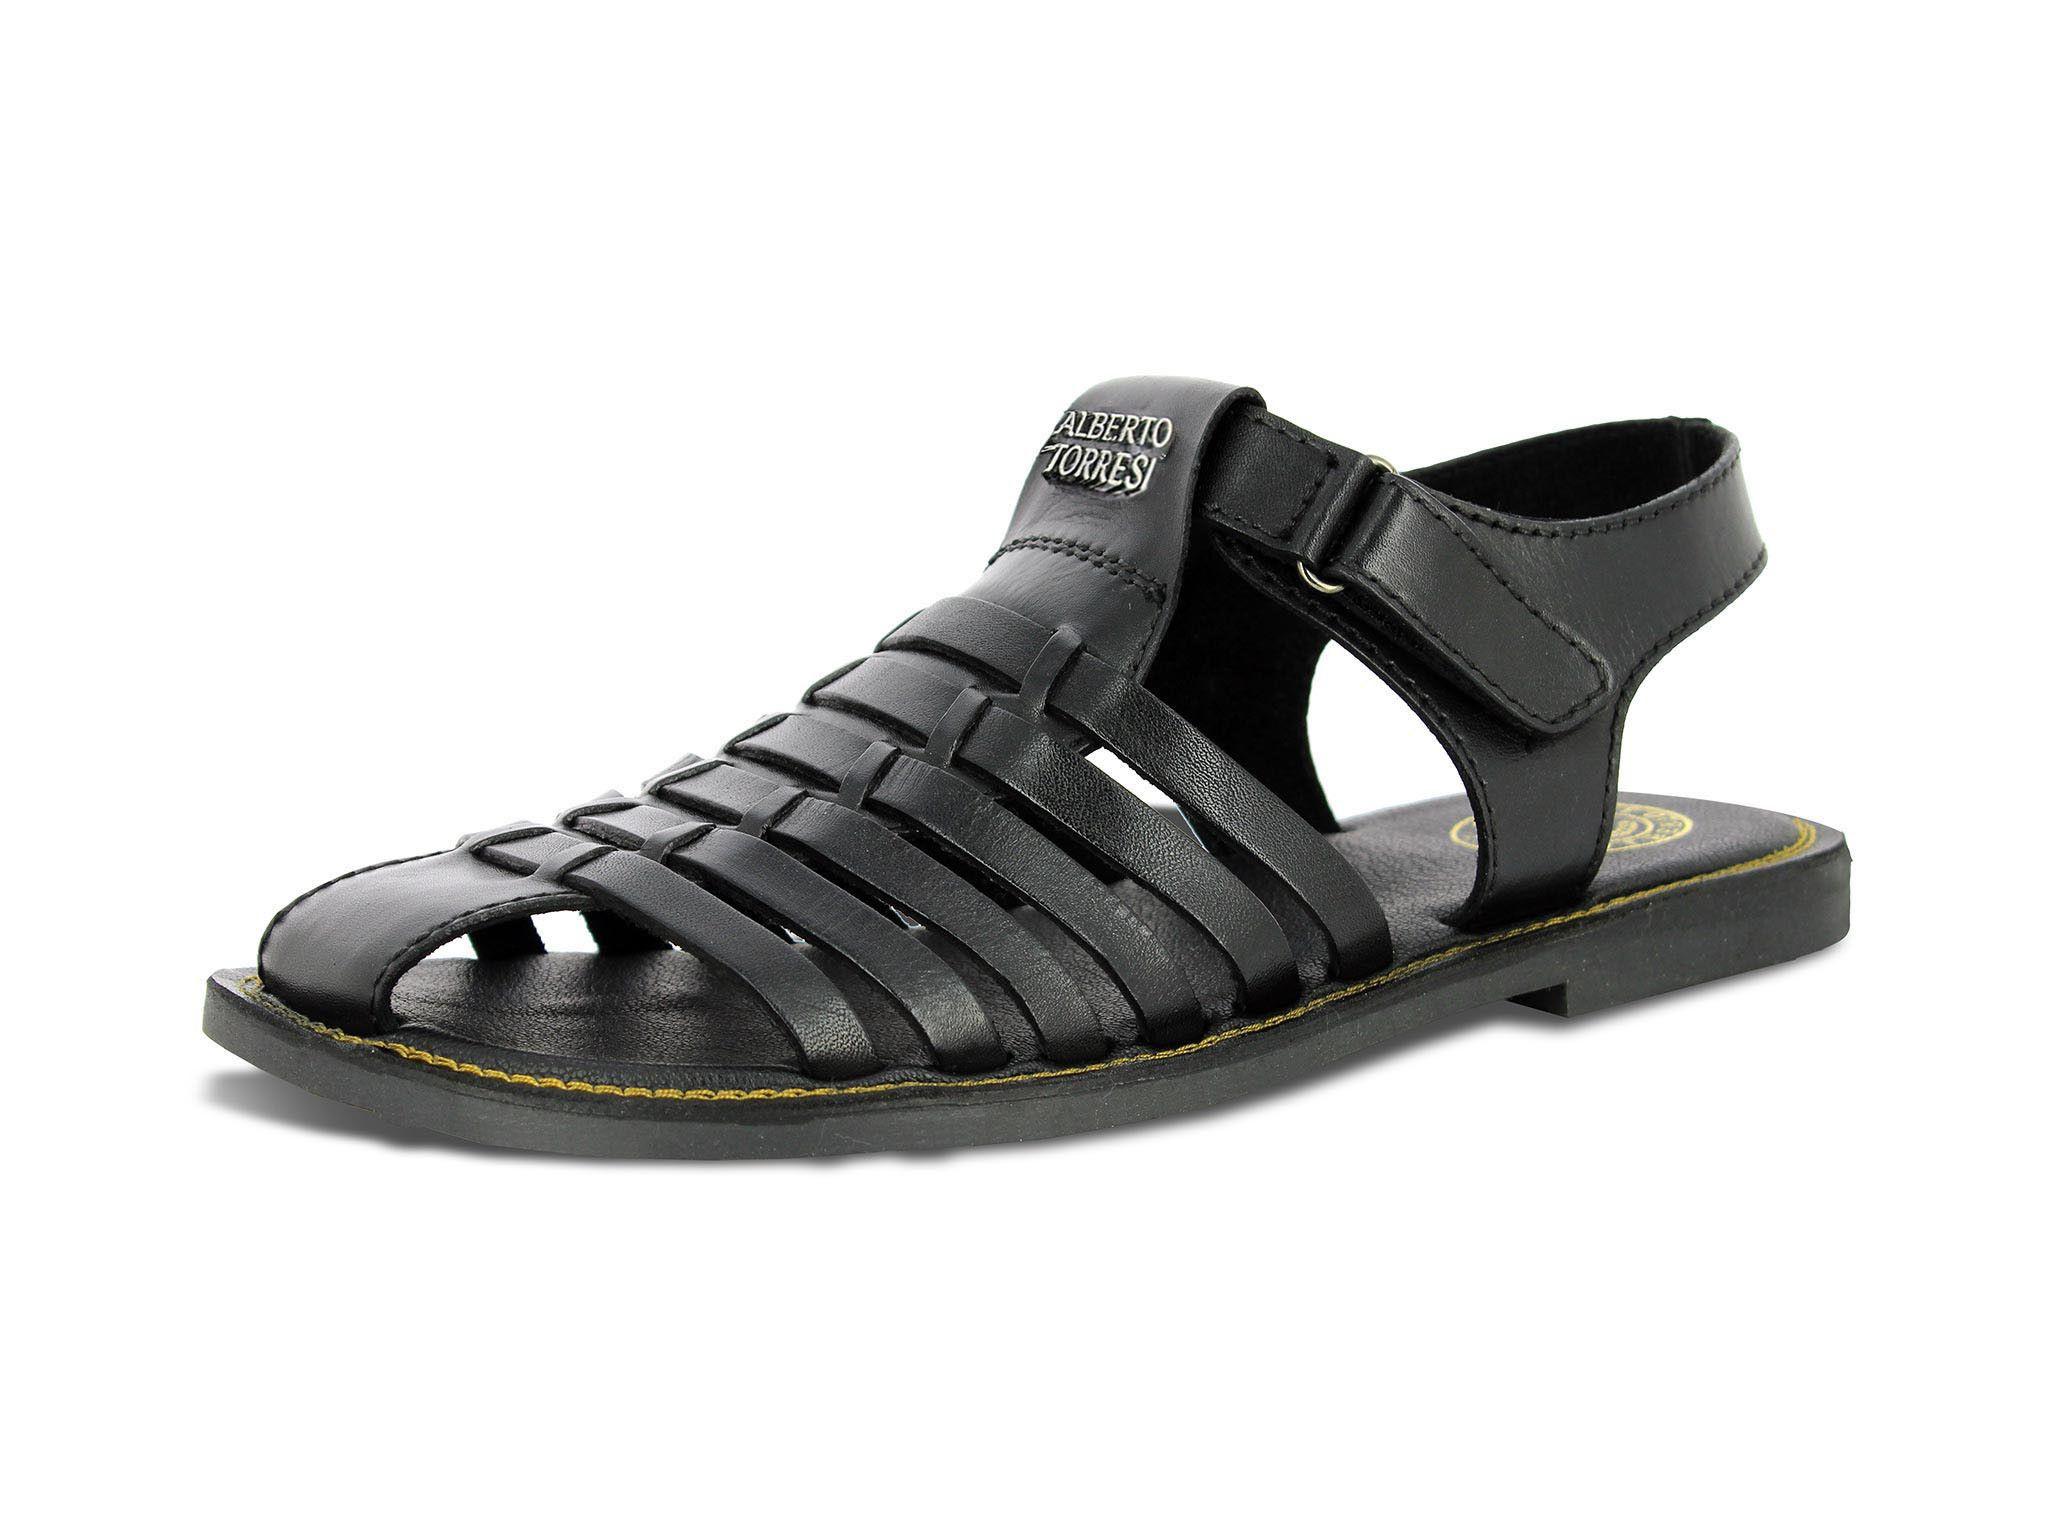 Buy Black Leather Sandals For Men Online Giovanni